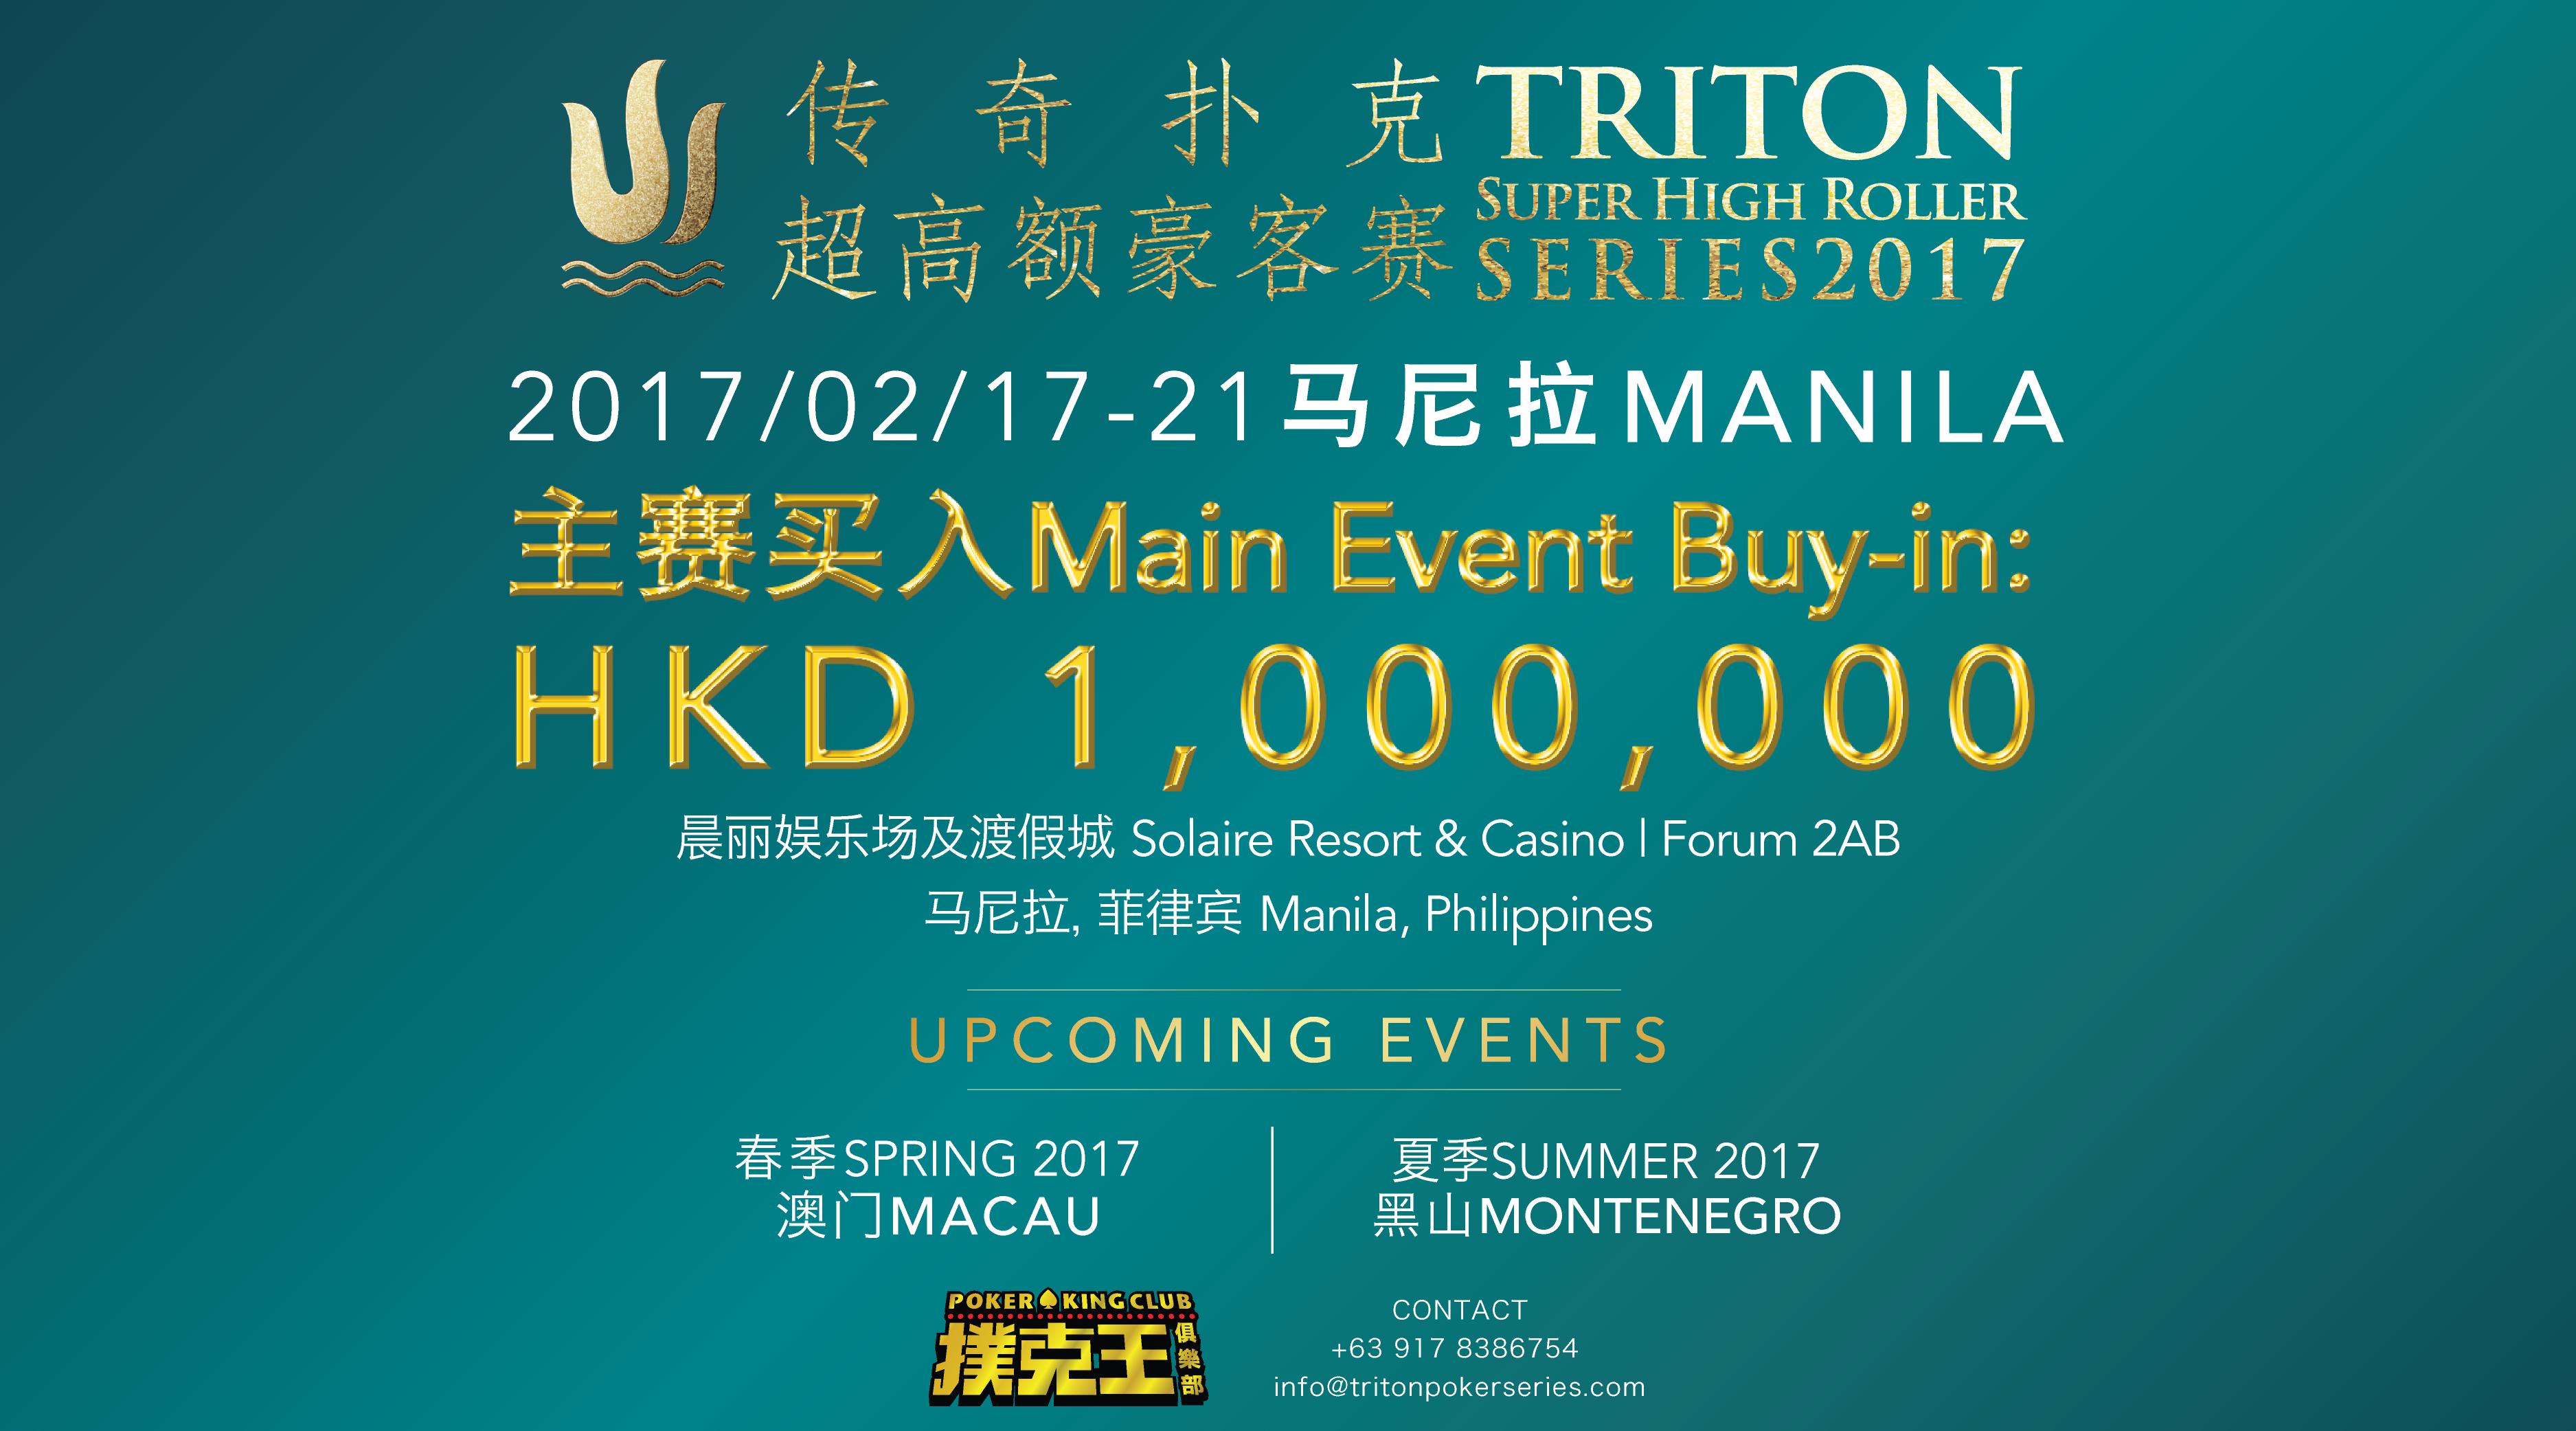 Triton_HighRoller_Serie_2